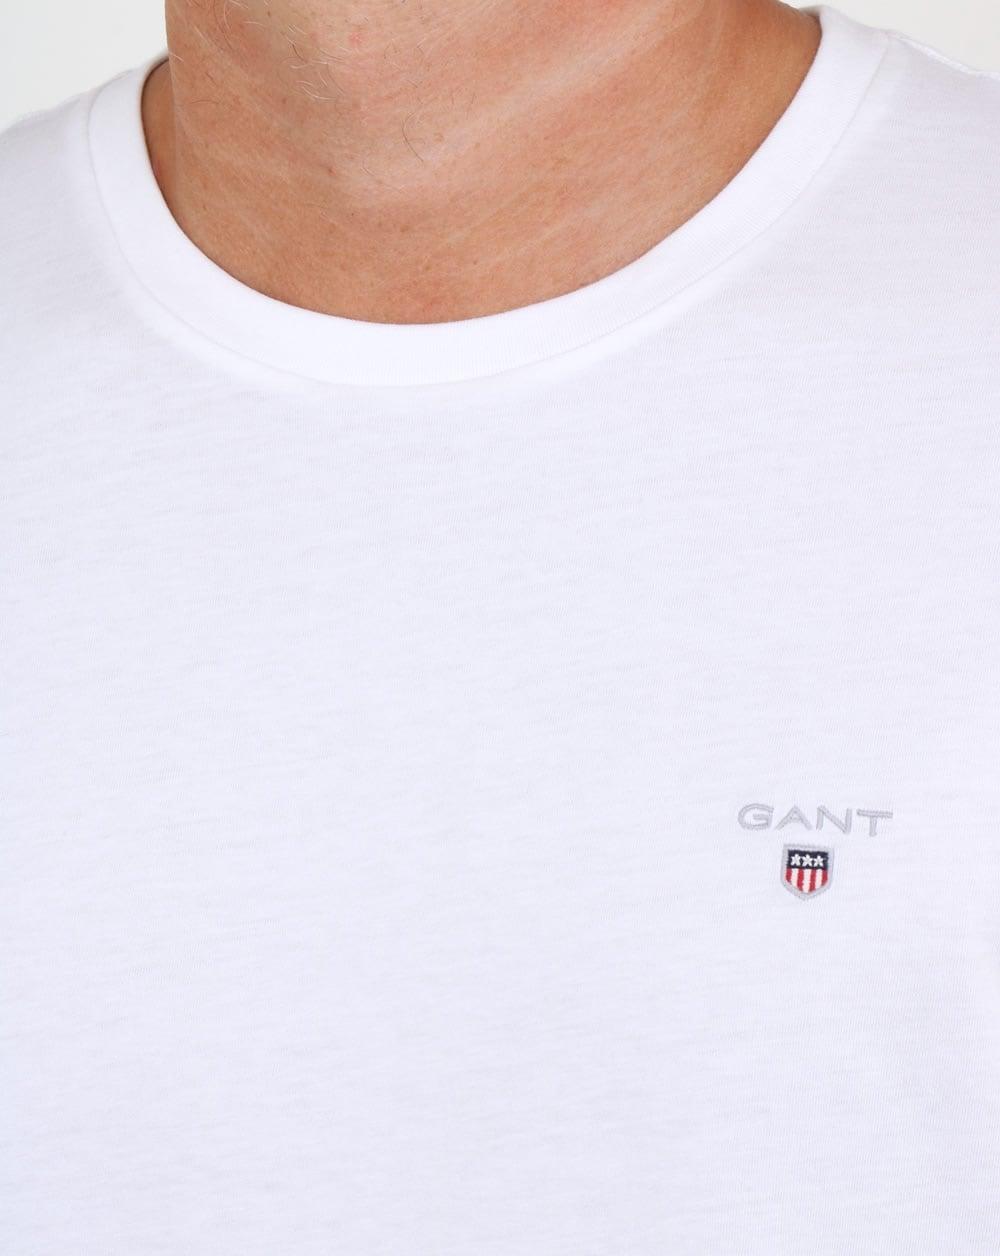 a045b68ff29e07 Gant Solid Crew Neck T Shirt White | 80s casual classics